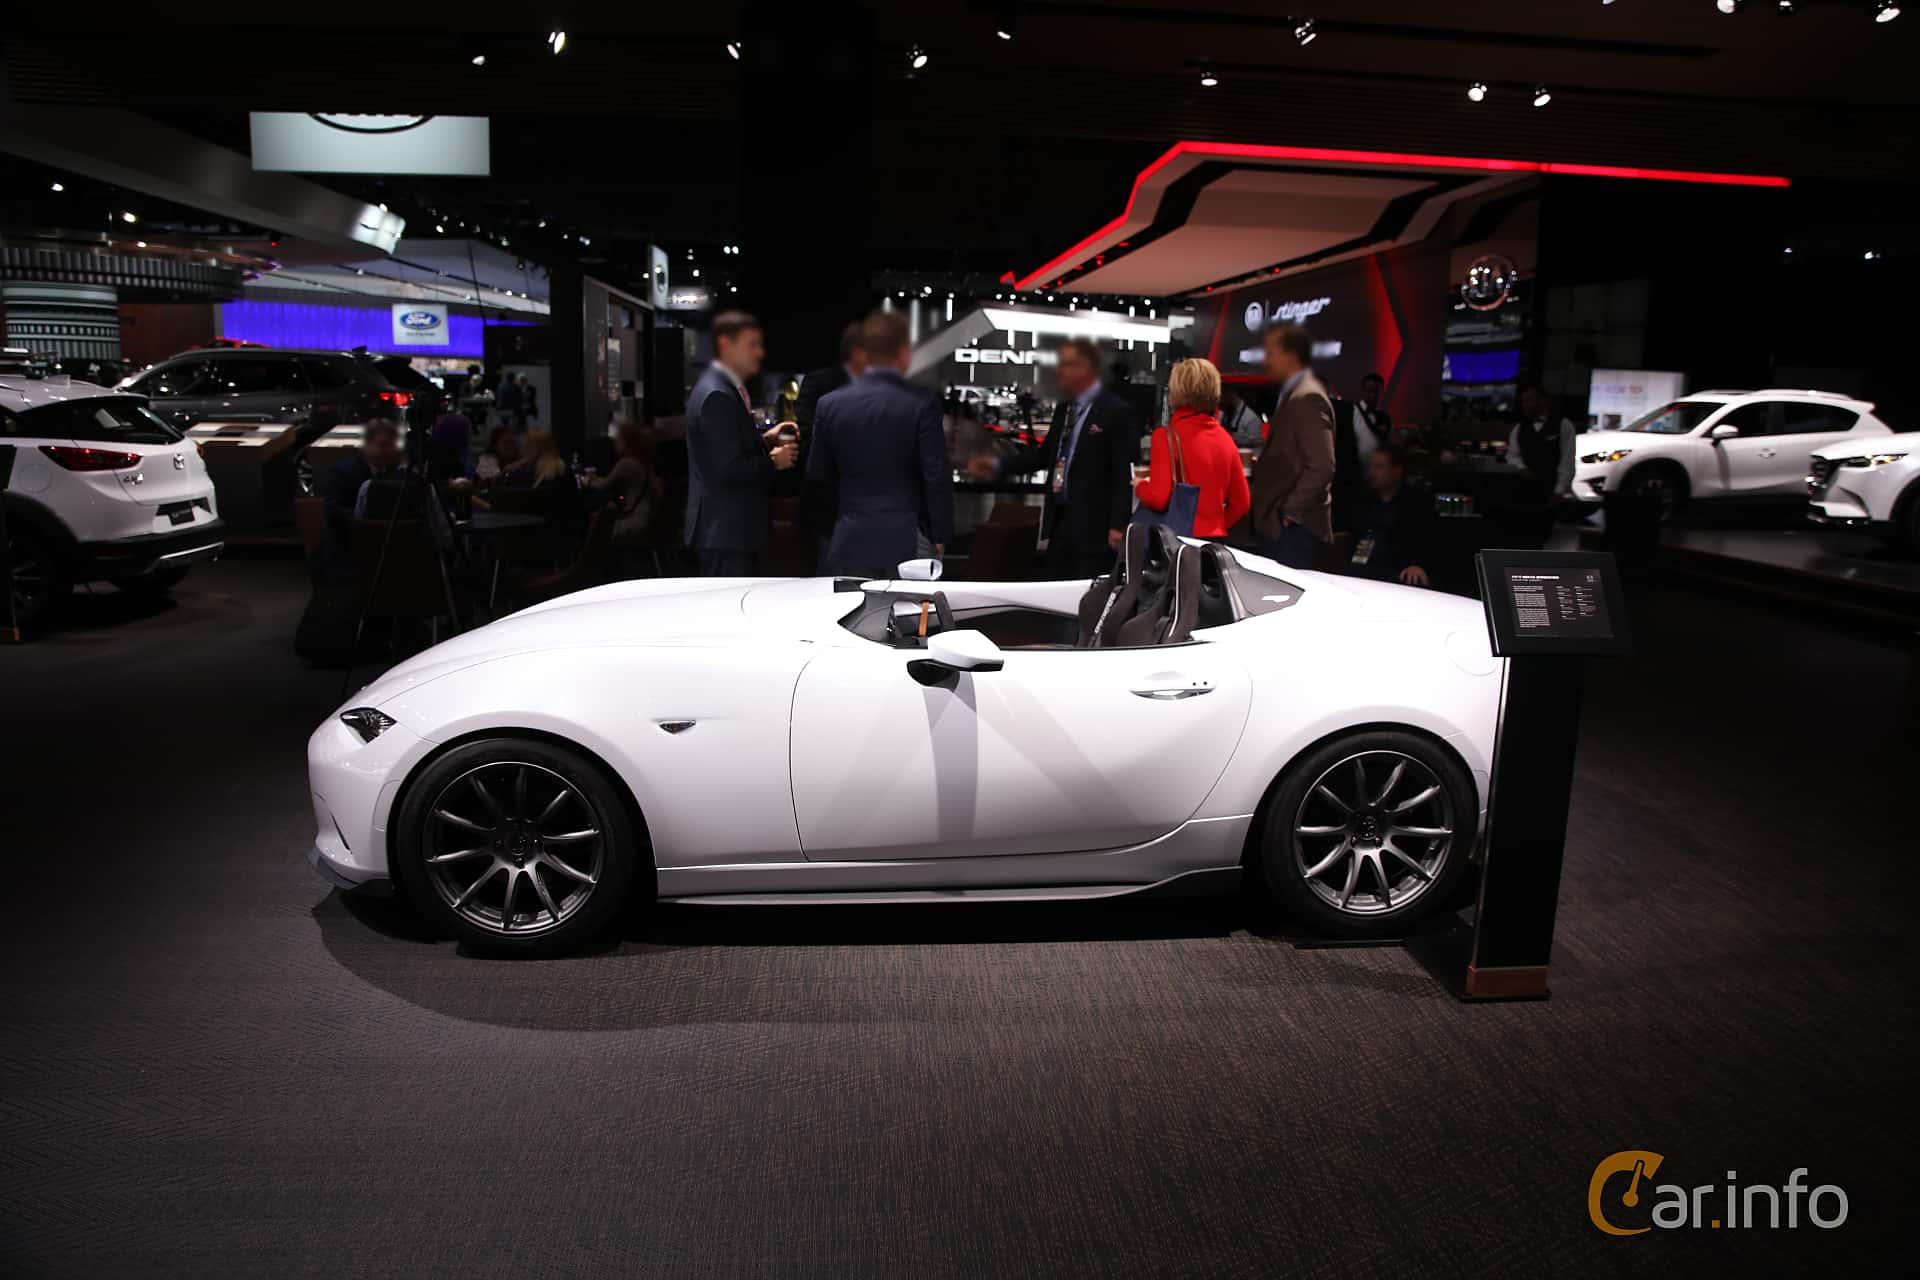 https://s.car.info/image_files/1920/mazda-mx-5-miata-speedster-evolution-side-north-american-international-auto-show-2017-2-318233.jpg